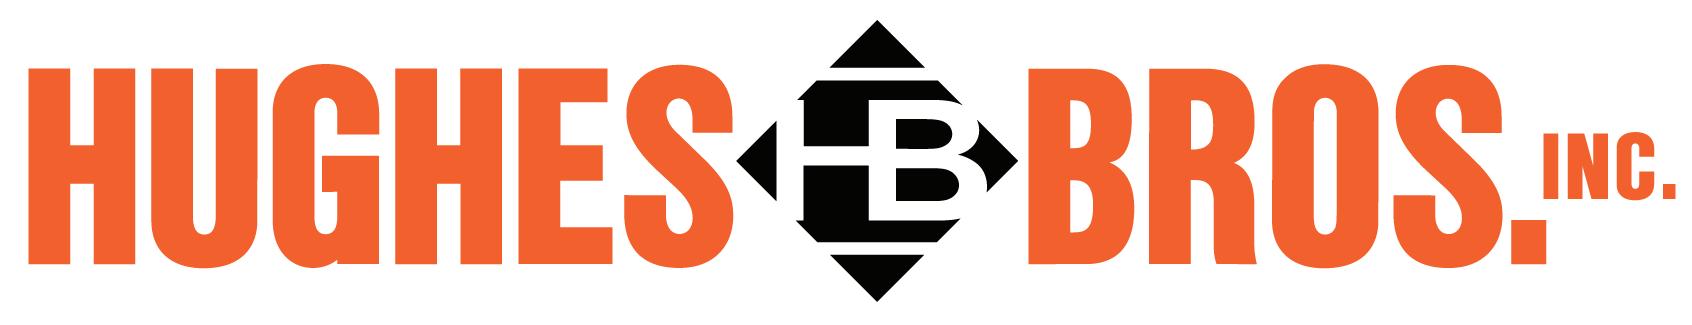 Hughes Bros Inc